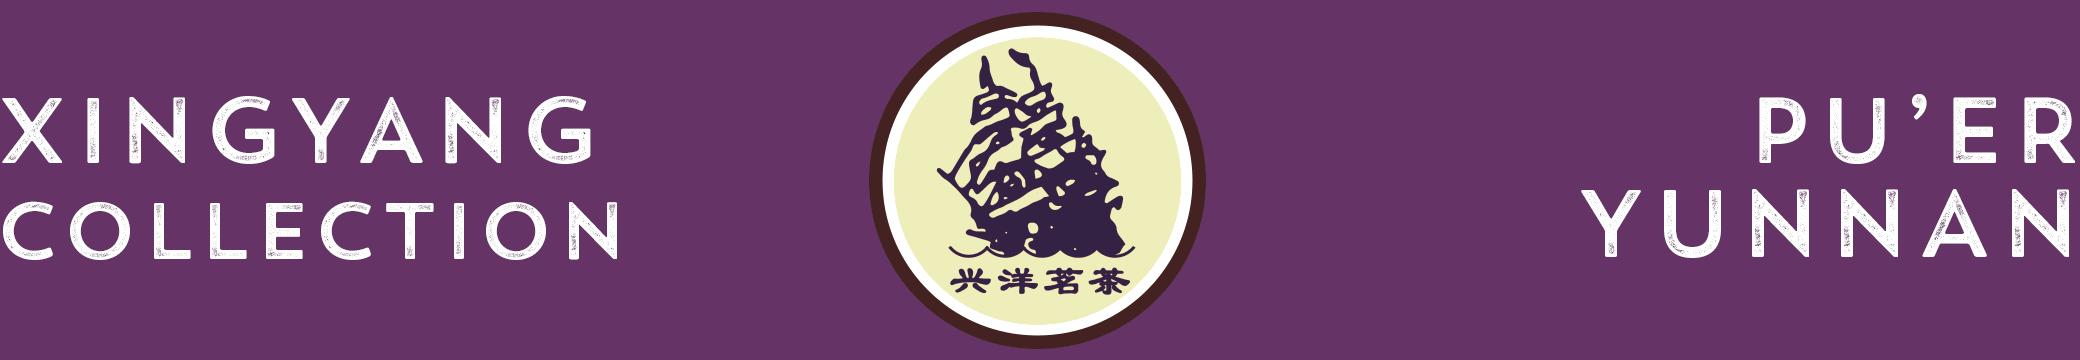 shop-xingyang-banner